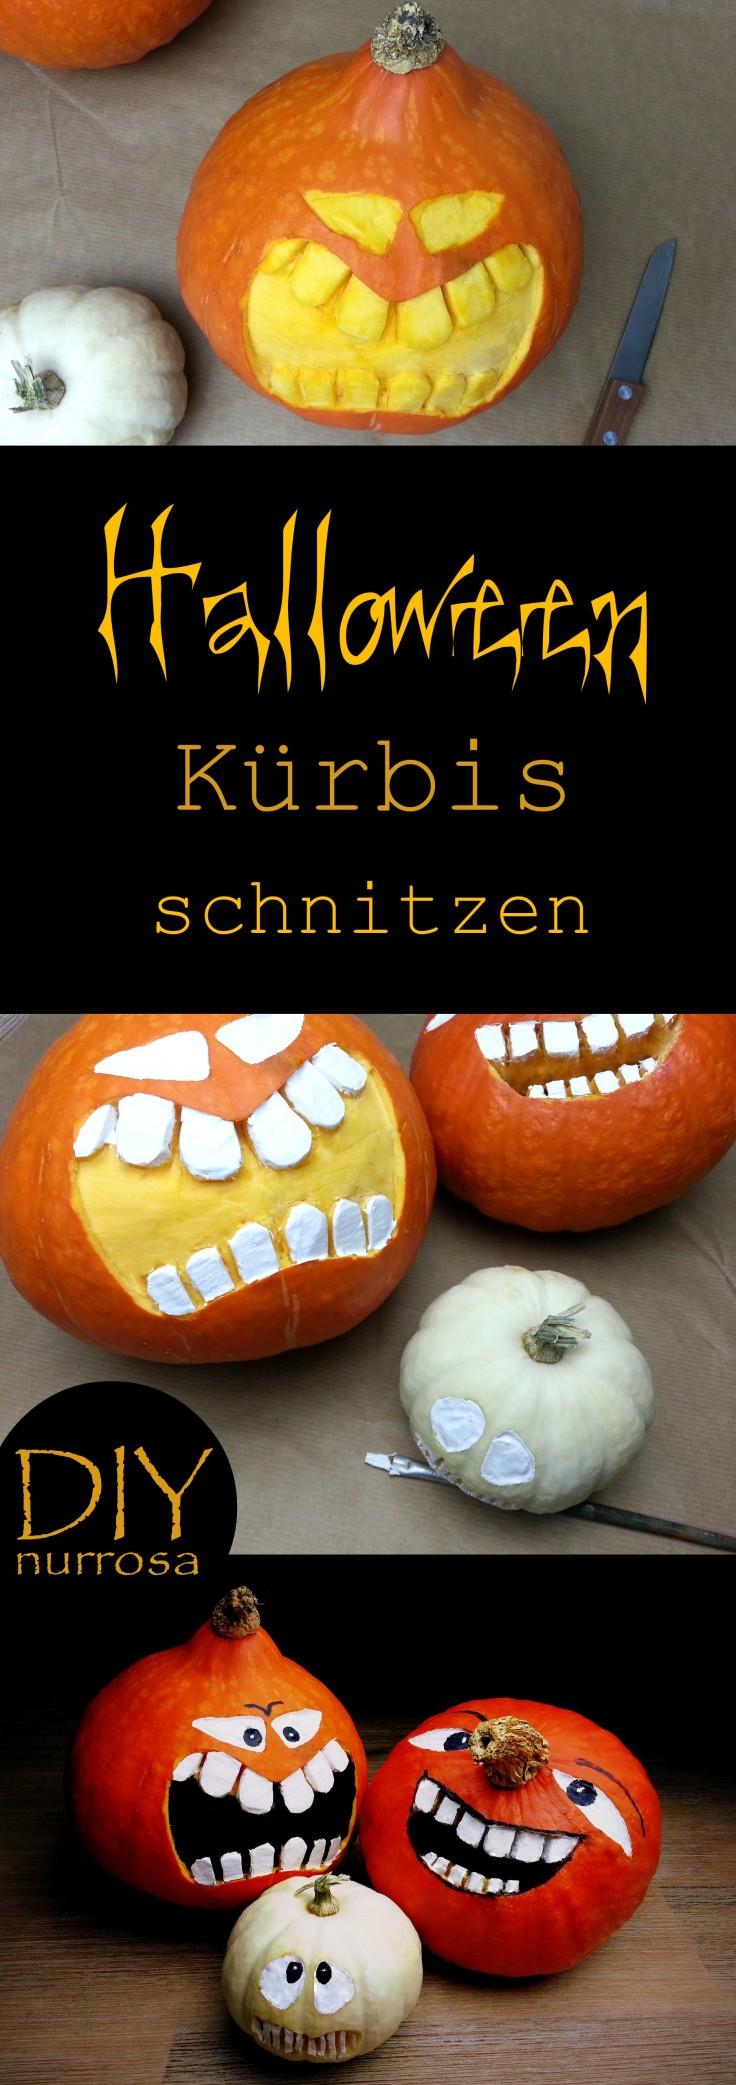 Halloween Kürbis Anleitung